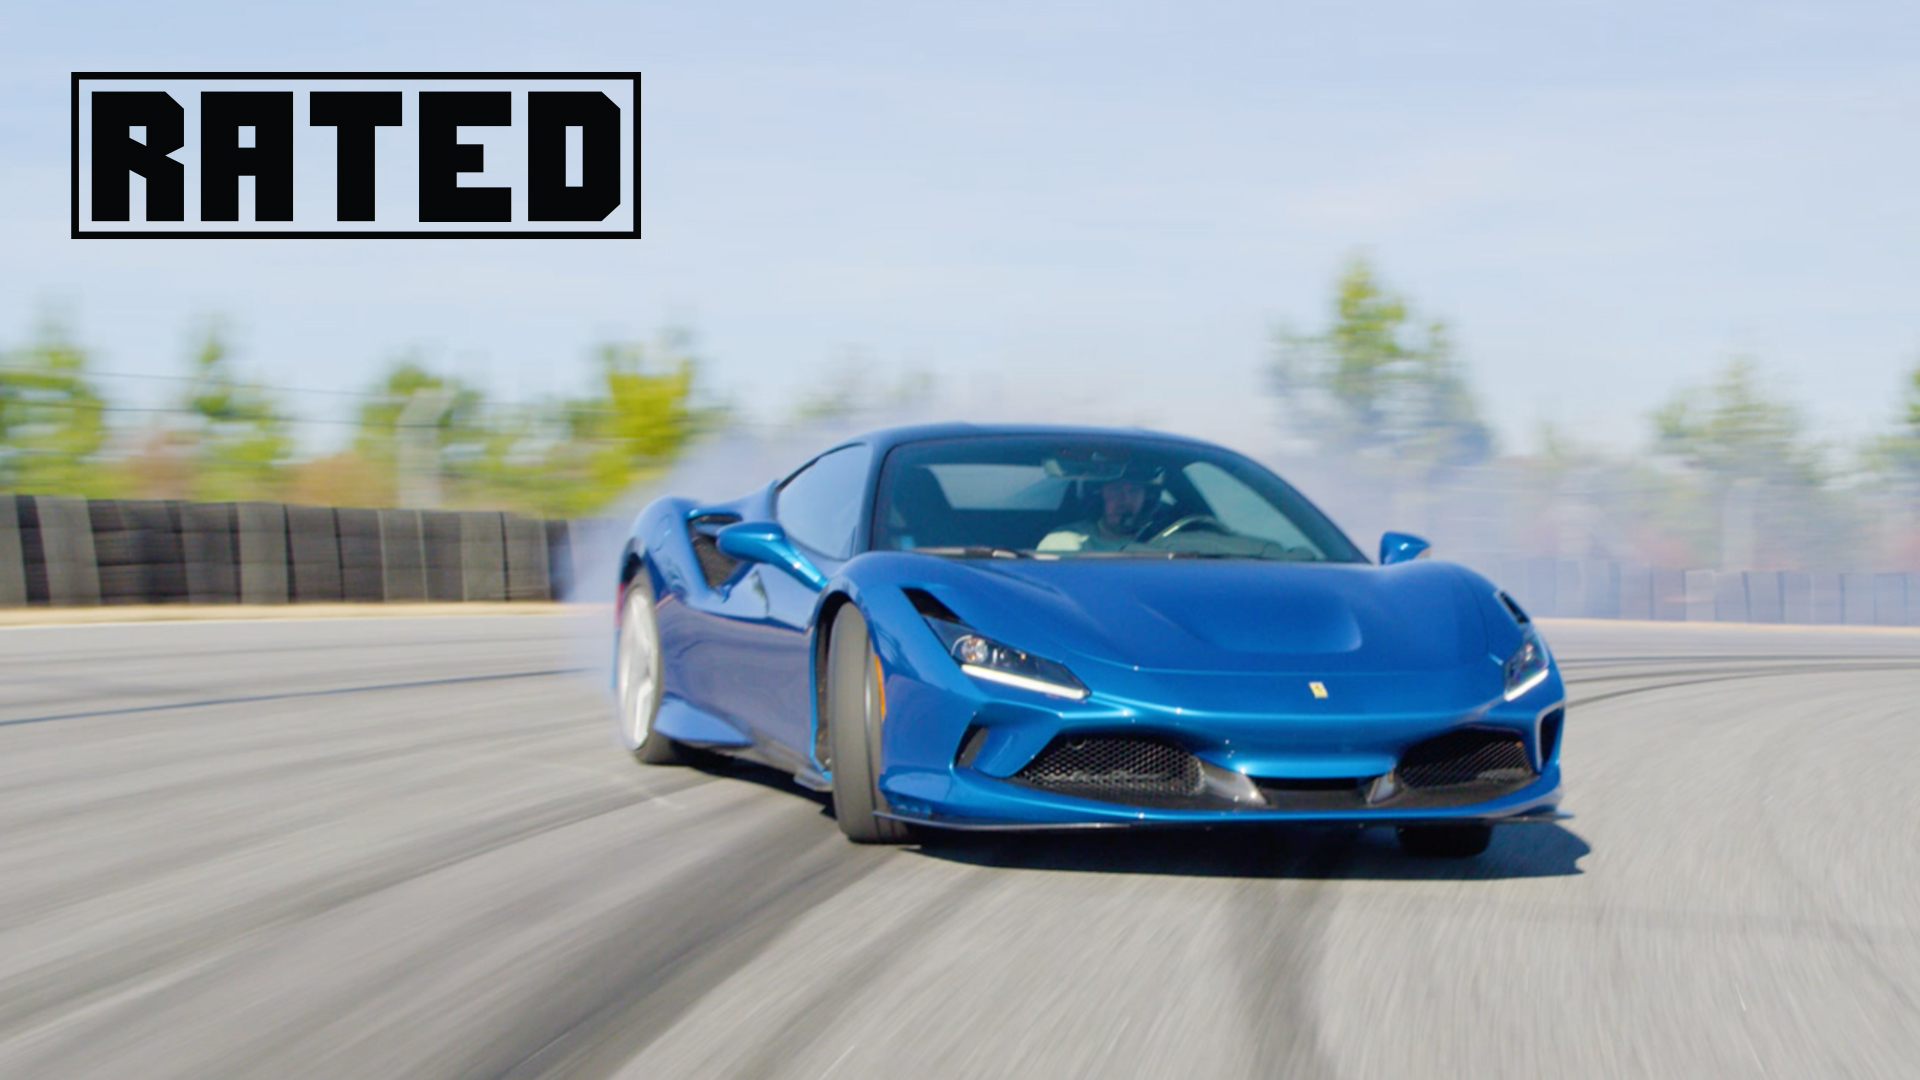 Rated 2020 Ferrari F8